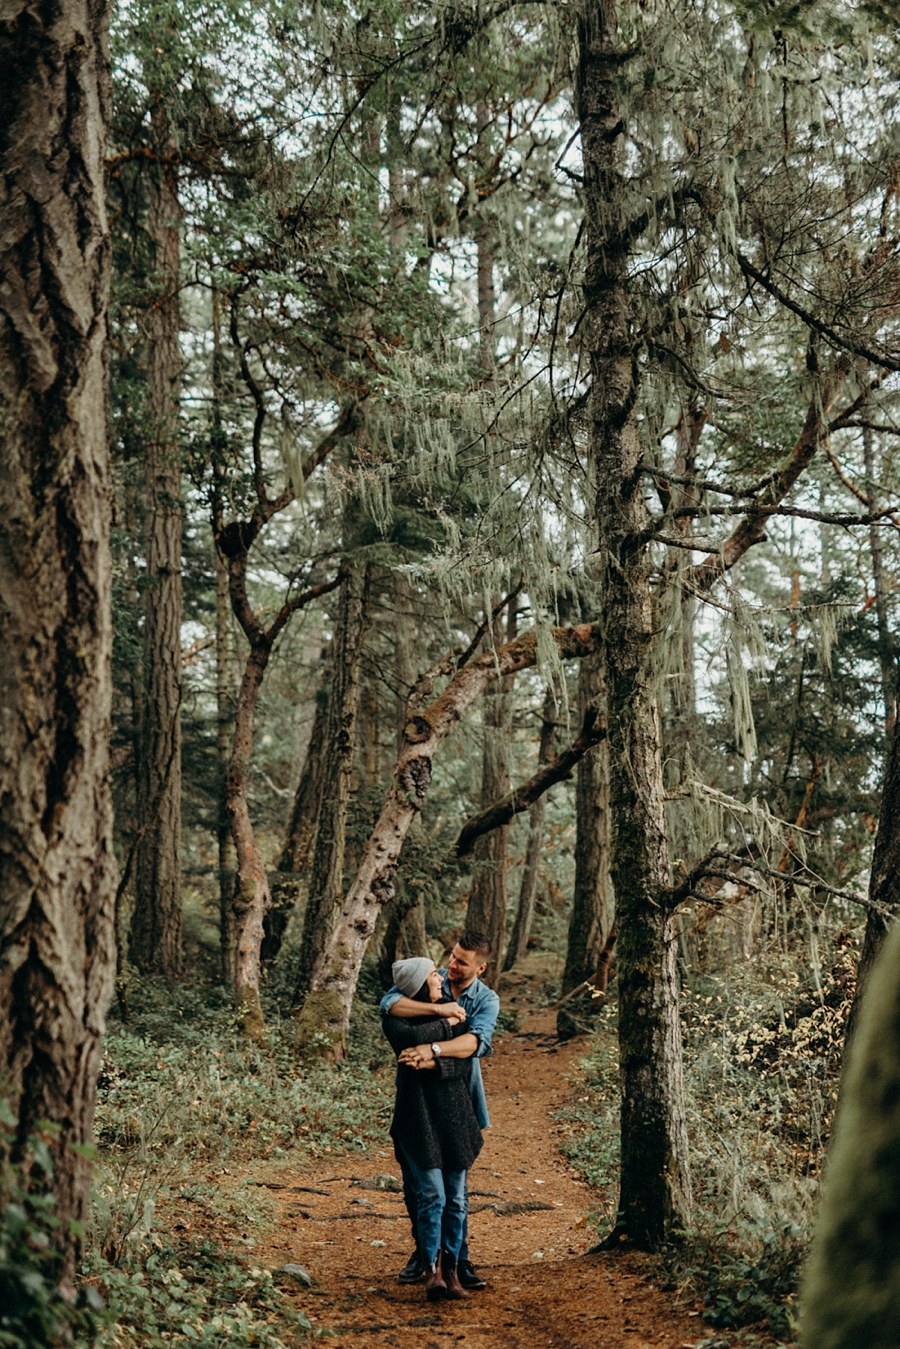 kaihla_tonai_intimate_wedding_elopement_photographer_7325.jpg